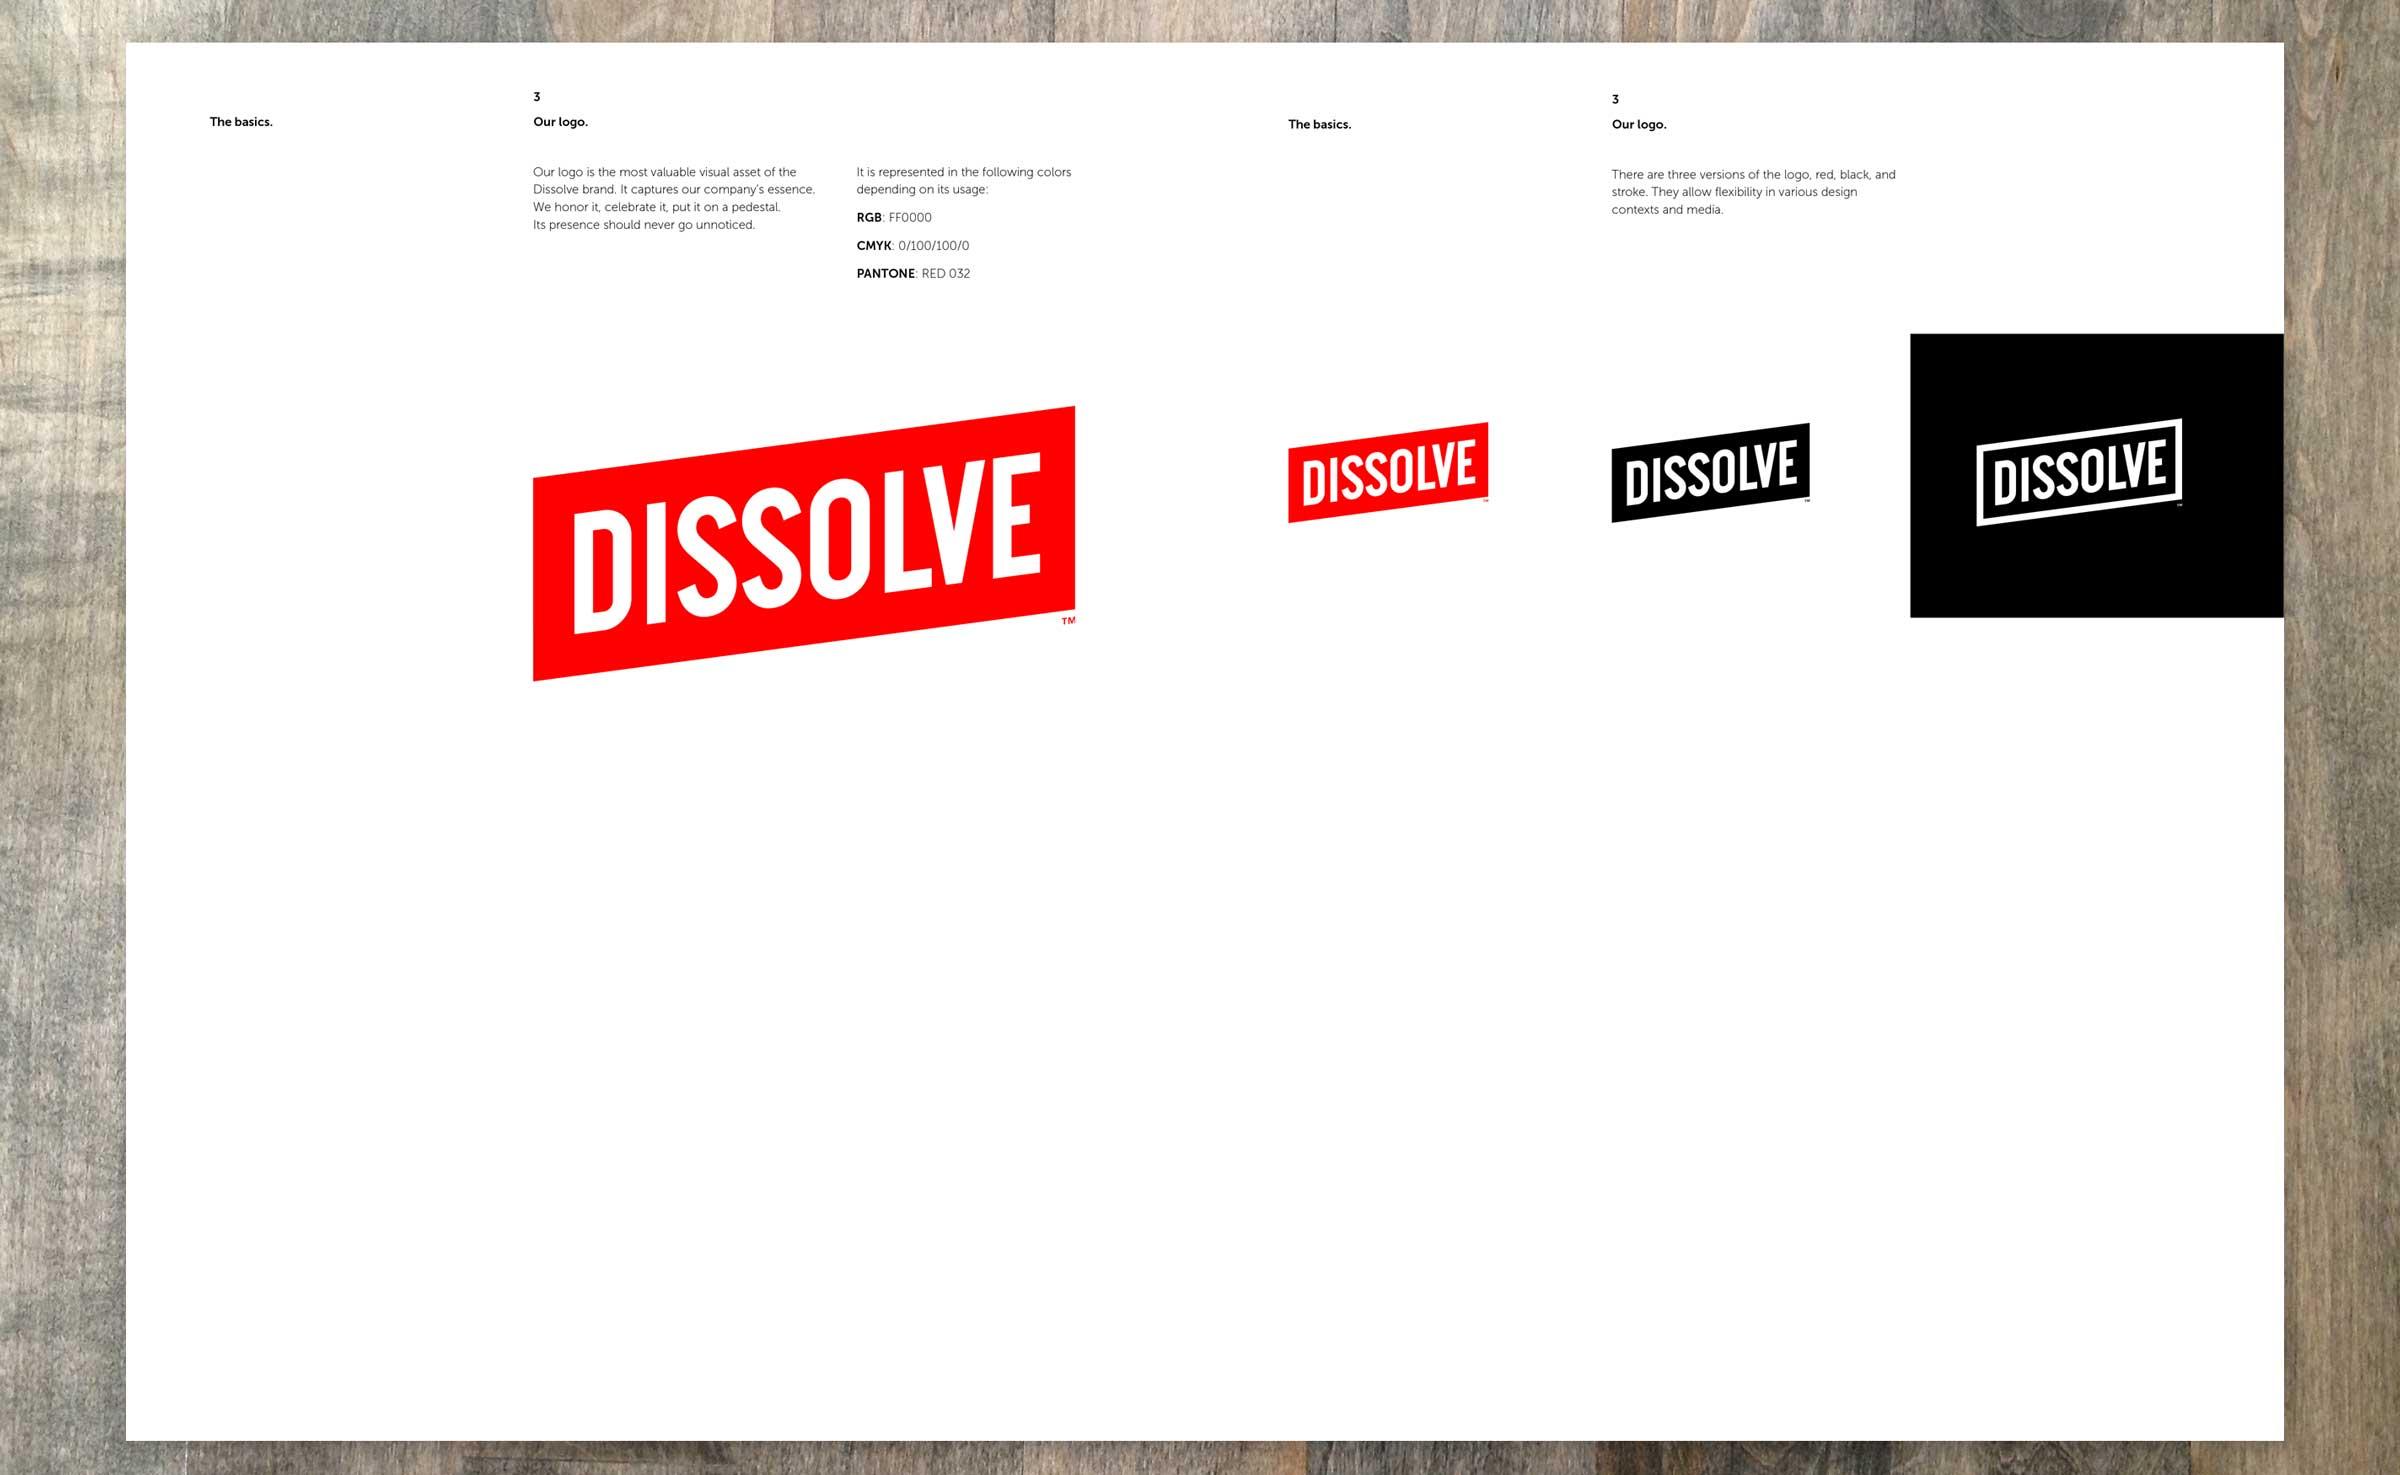 dissolve_logo1.jpg